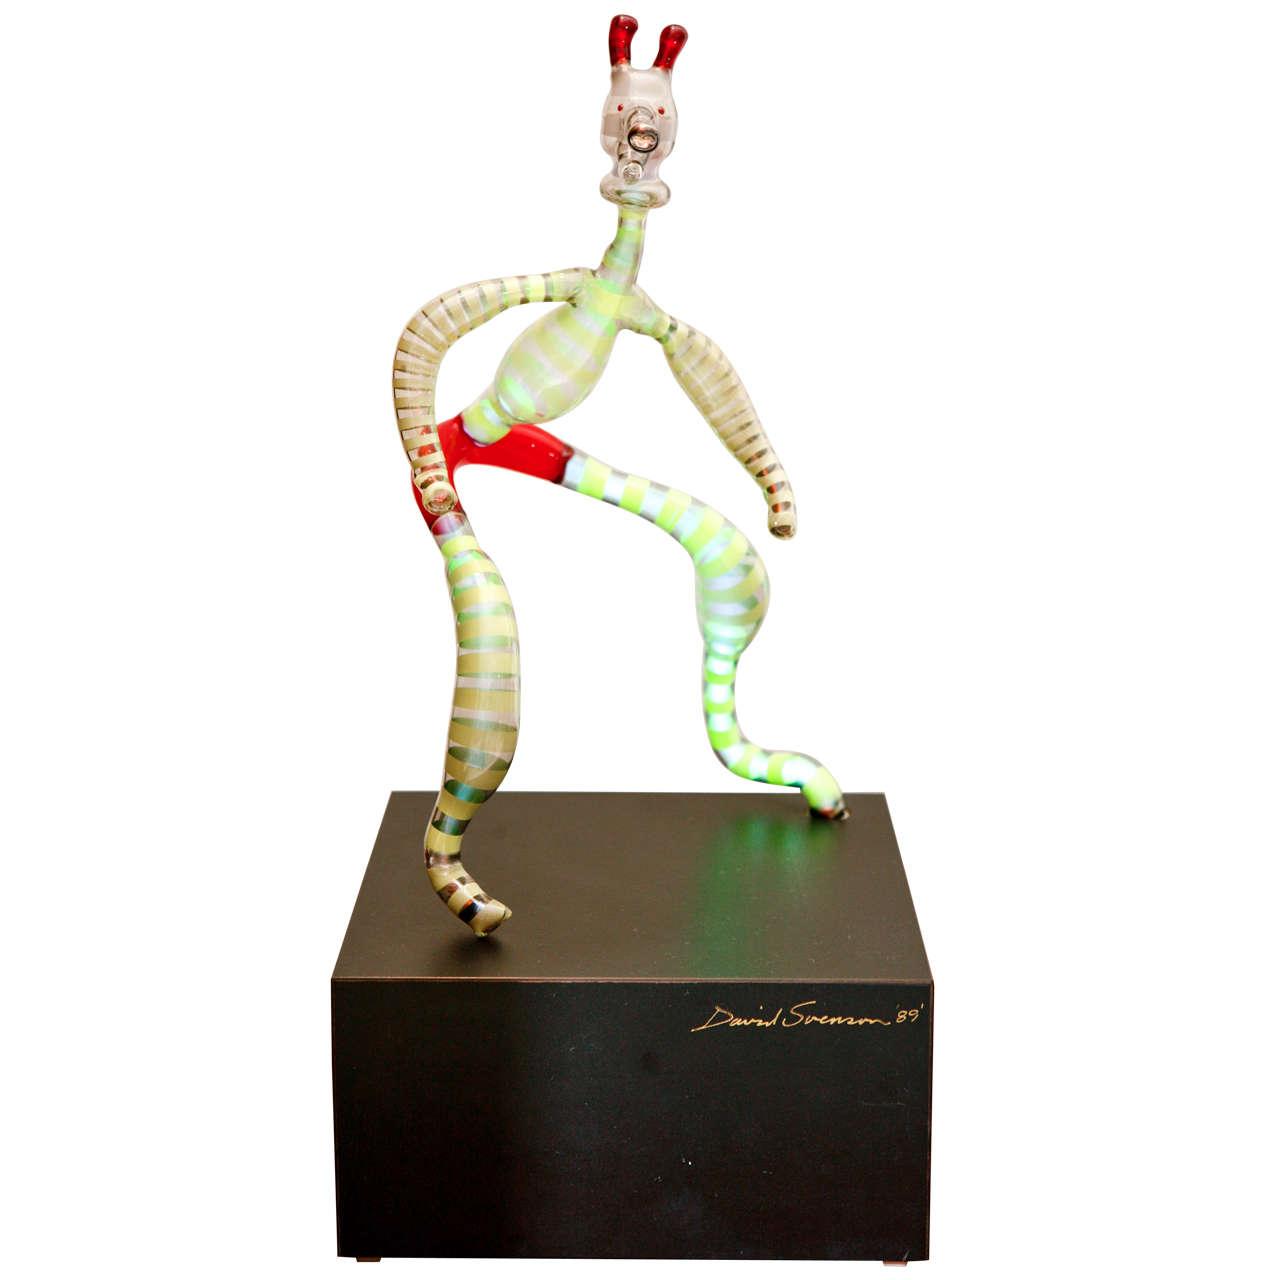 Neon Sculpture by David Svenson For Sale